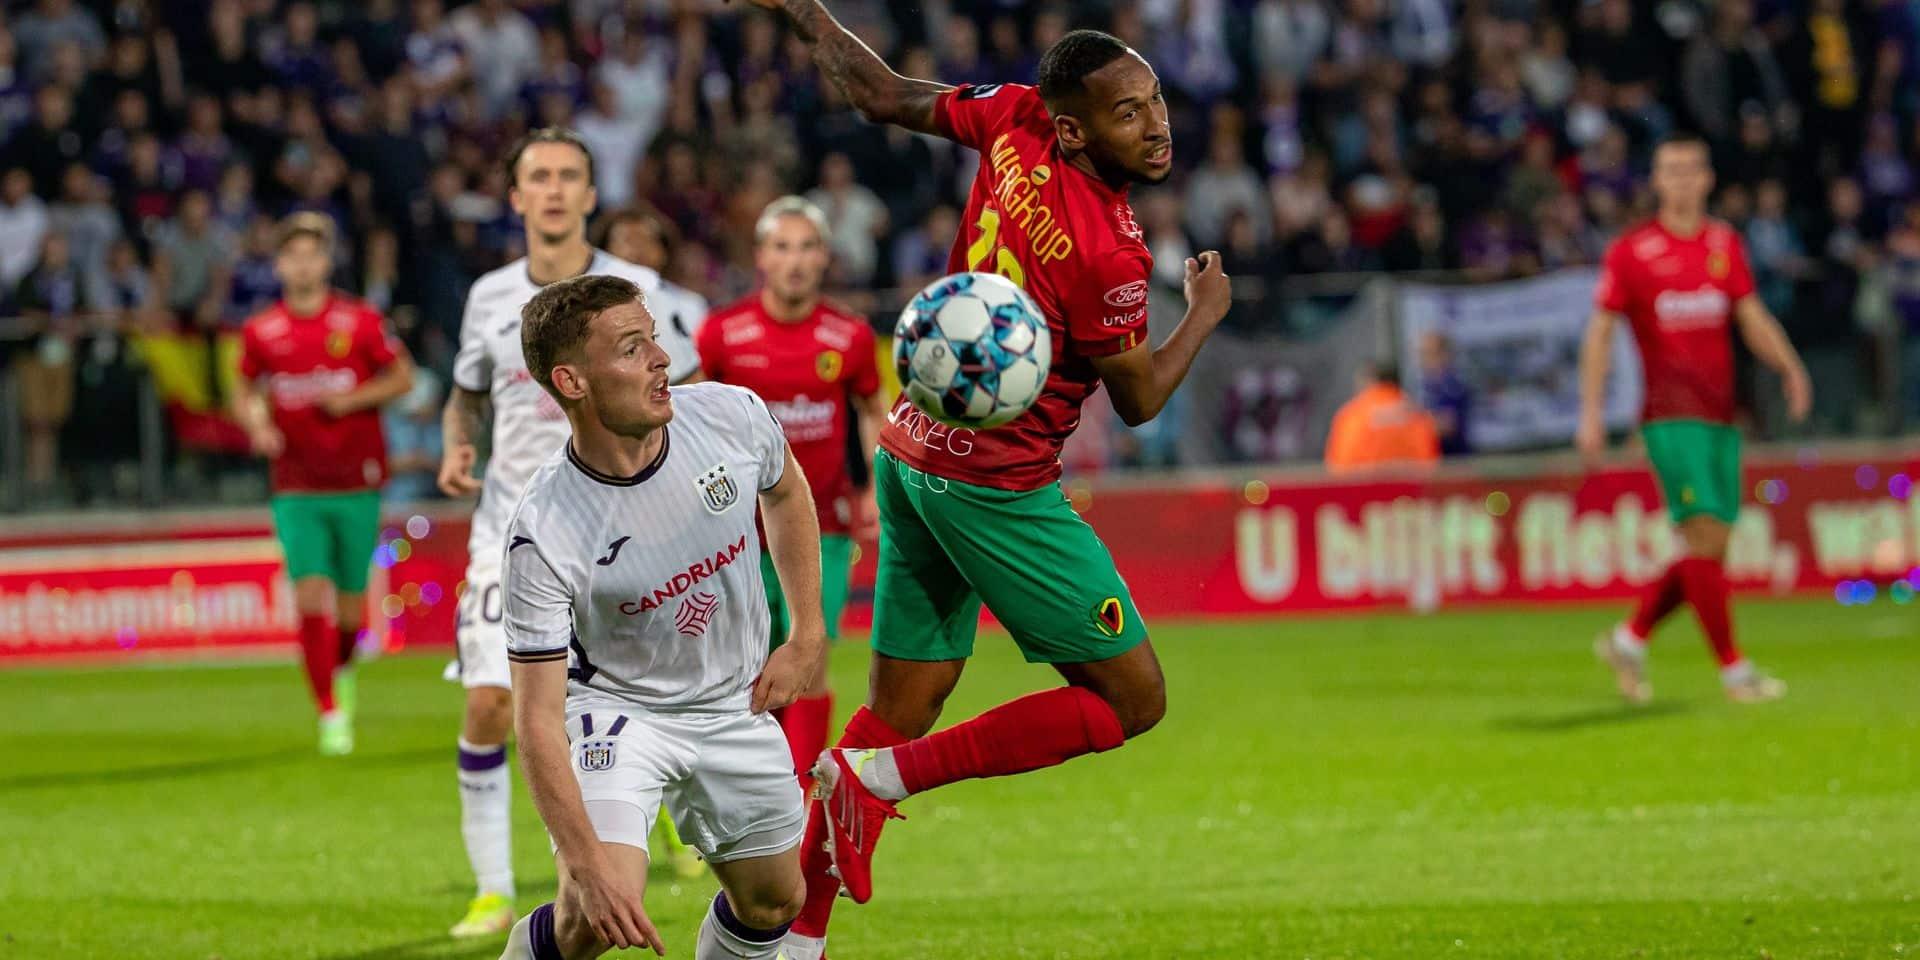 Gomez solide, Hoedt fébrile : les notes des Anderlechtois face à Ostende